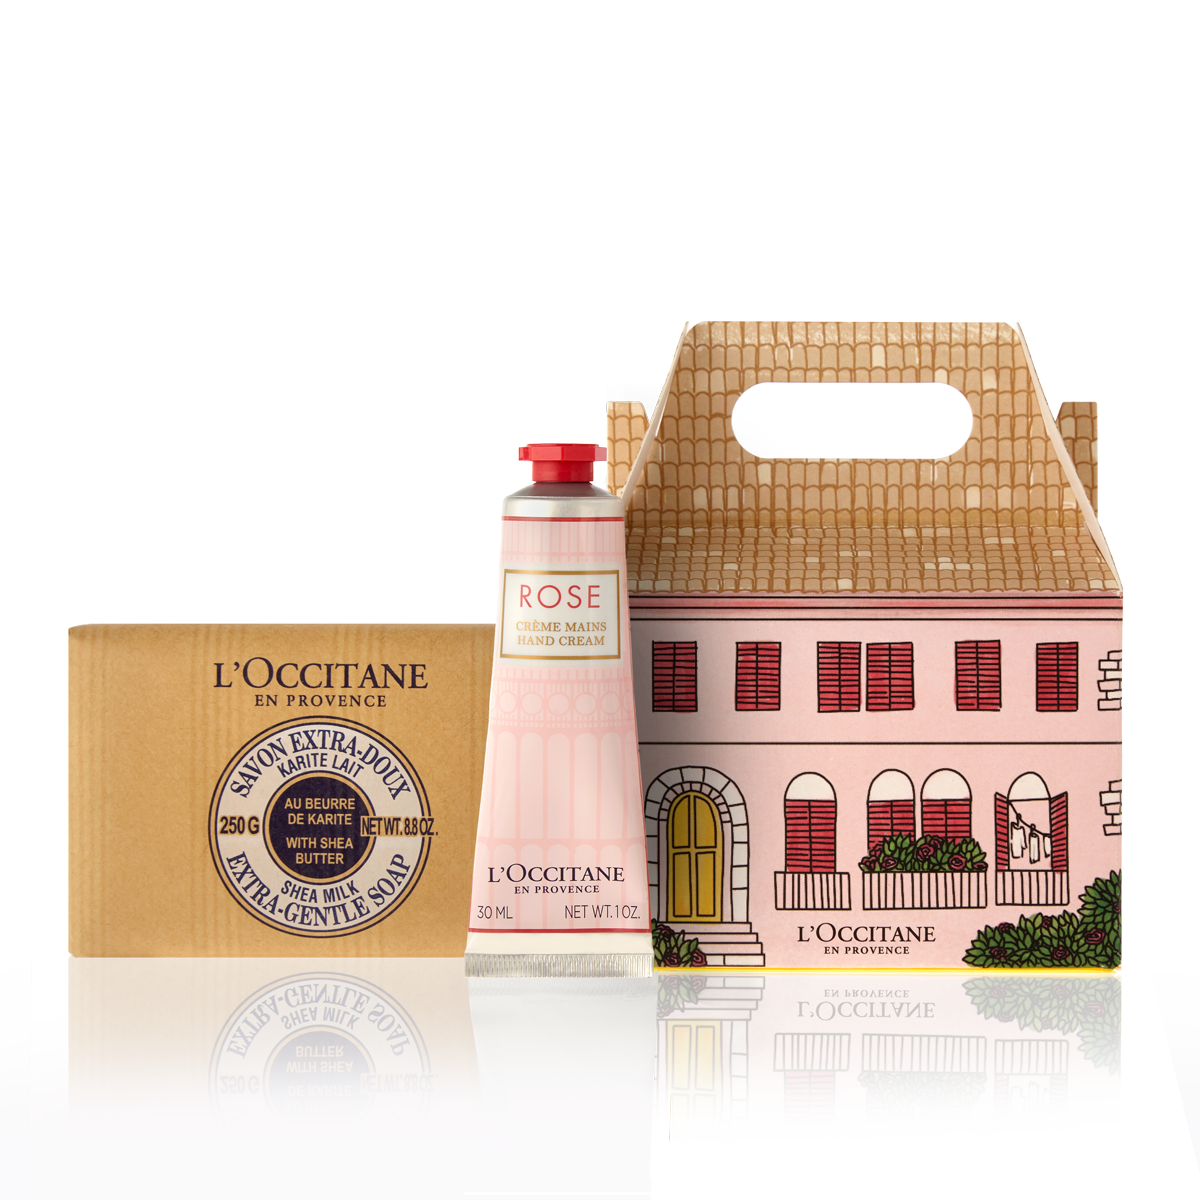 L'Occitane Rose Care Package